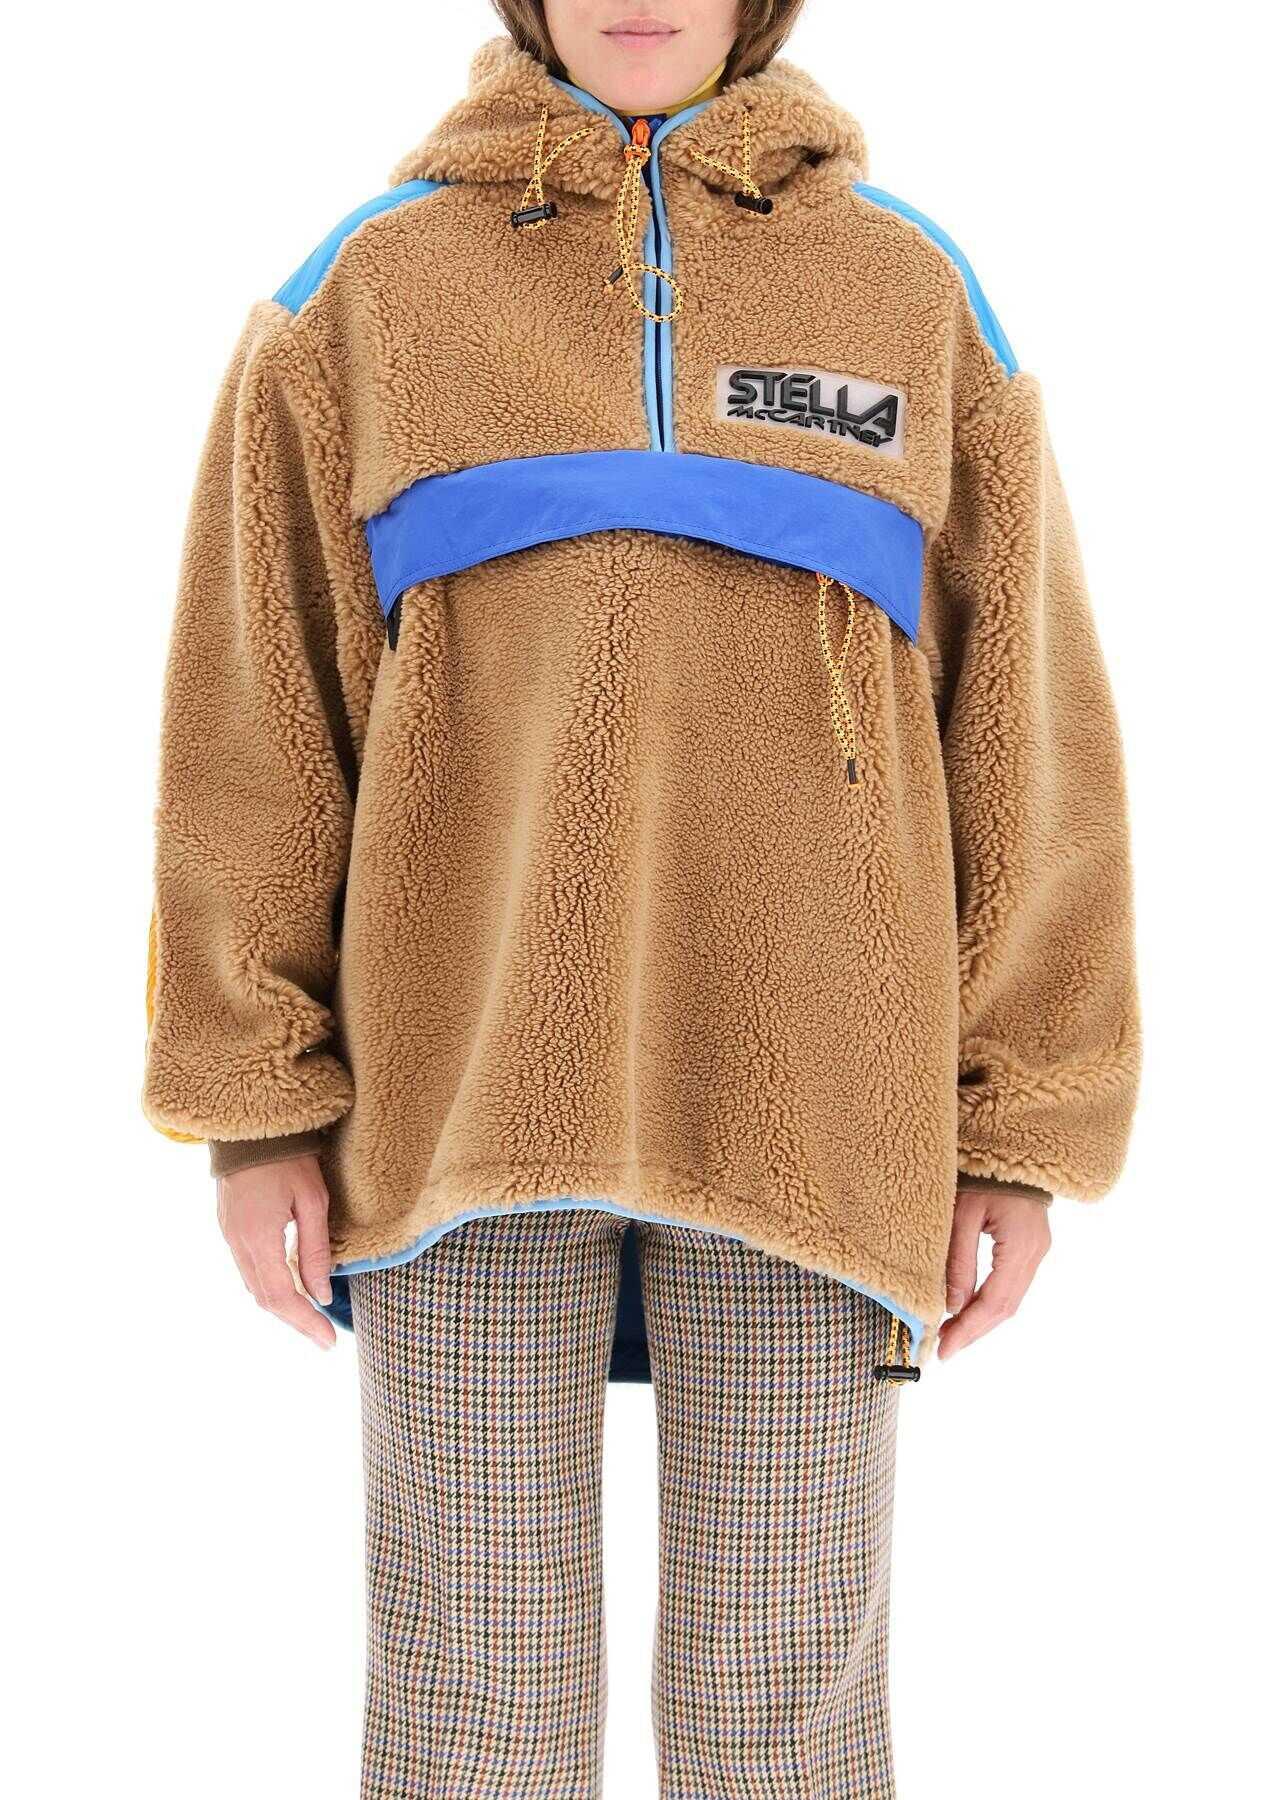 Stella McCartney Marlee Jacket In Teddy Mat 603726 SSB03 BISCUIT image0